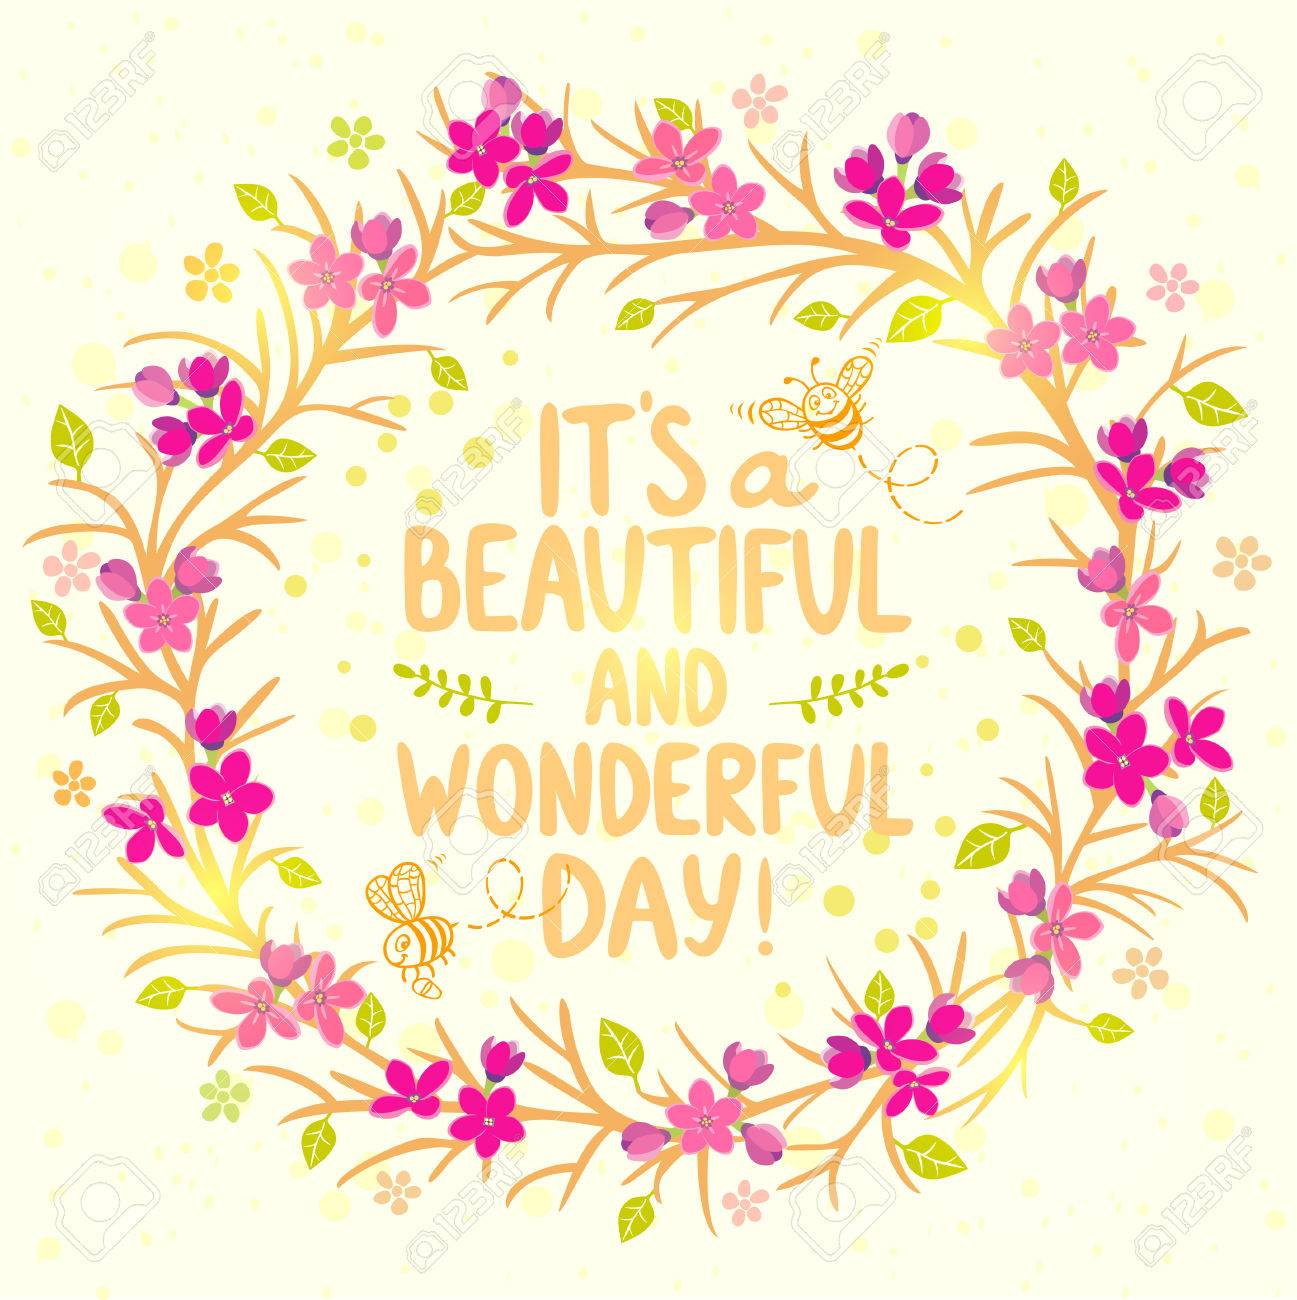 Stylish beautiful card wreath flowers with cute cartoon bees stylish beautiful card wreath flowers with cute cartoon bees and with text stock vector 31393488 izmirmasajfo